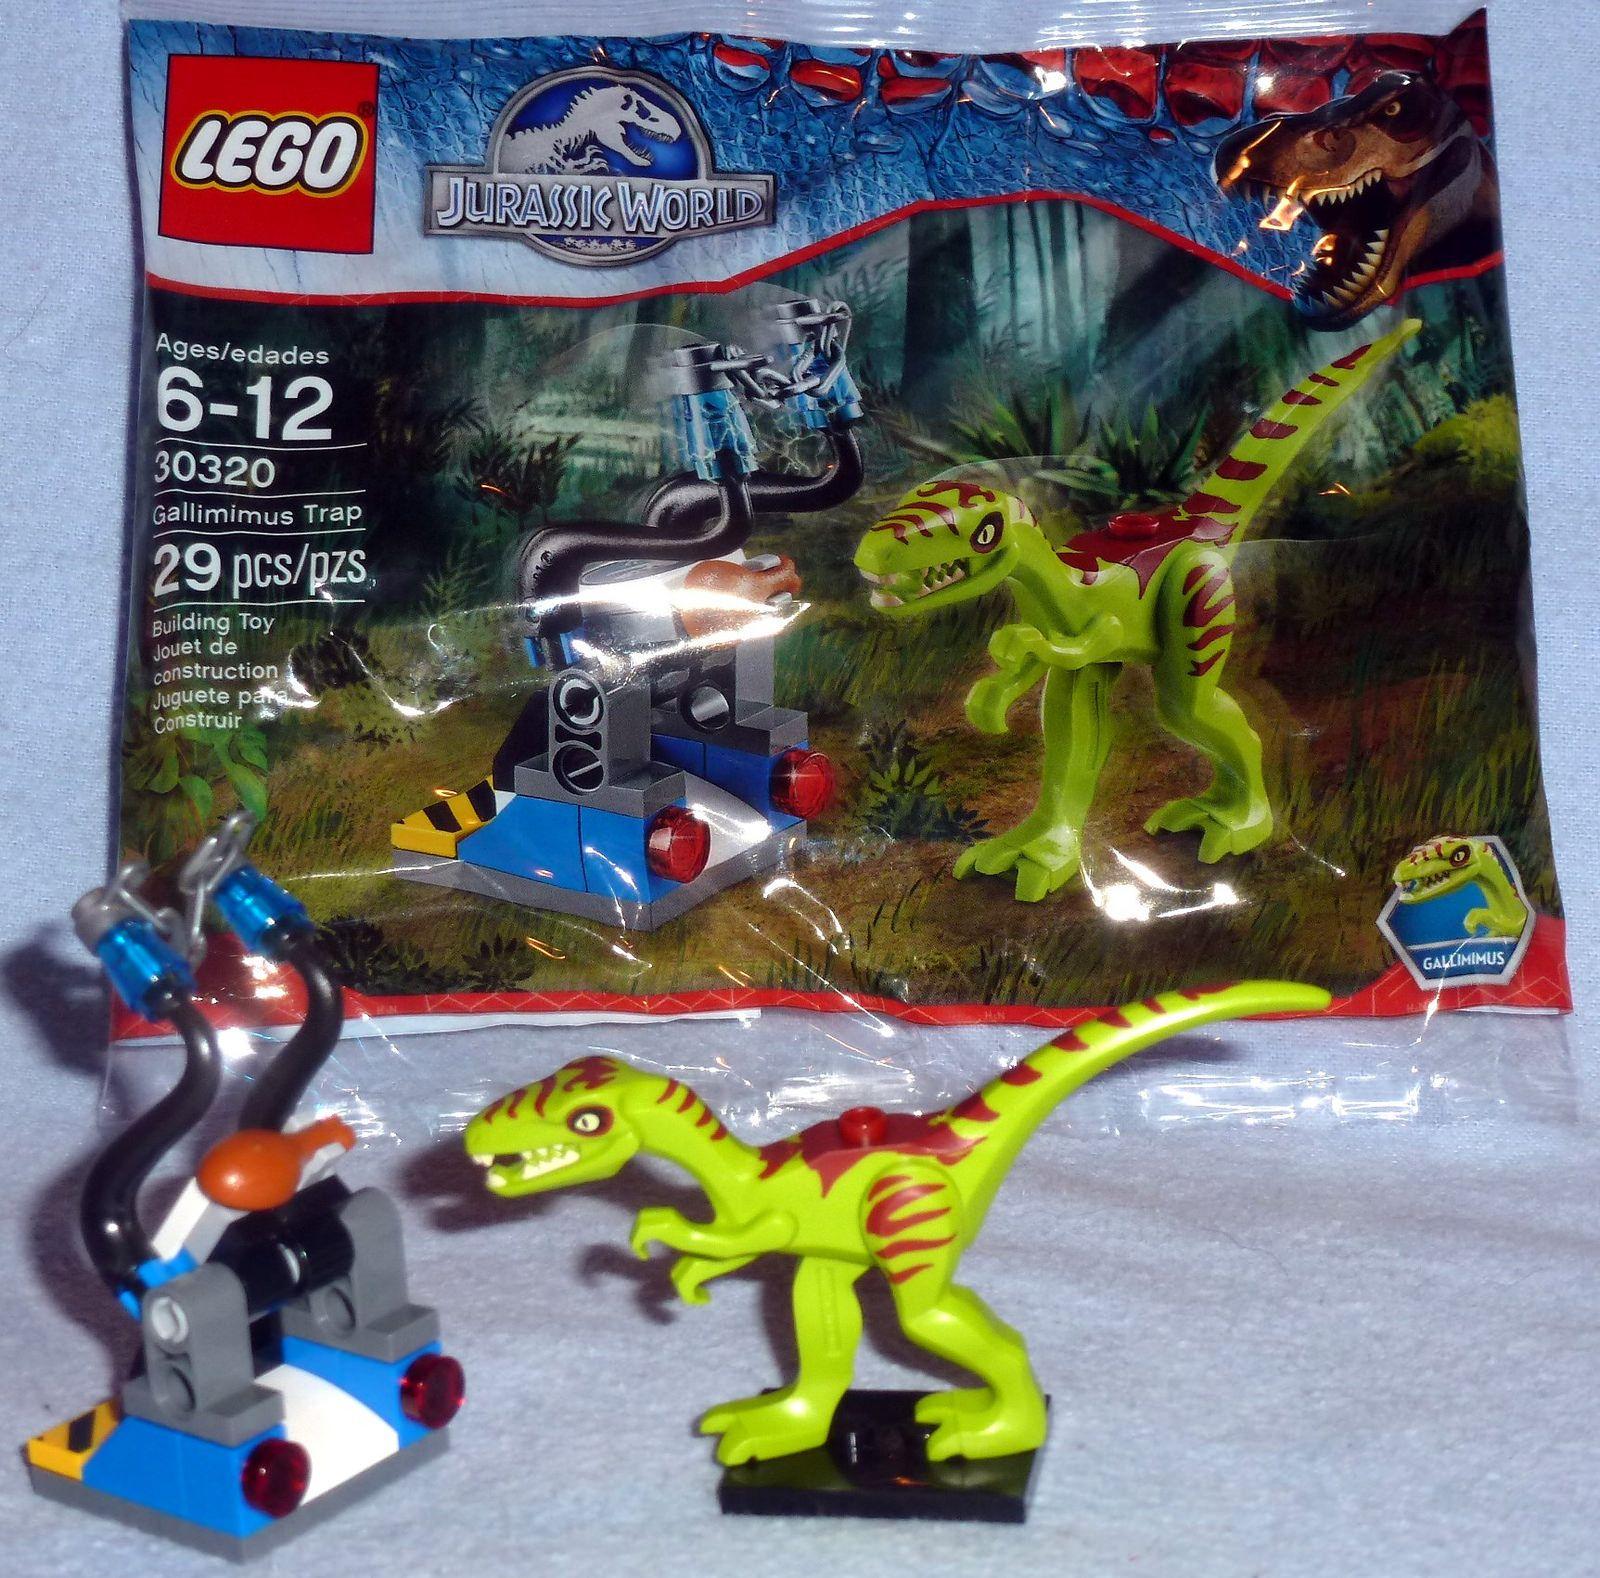 Lego 30320 Gallimimus Trap Misc Toys Lego Dinosaur